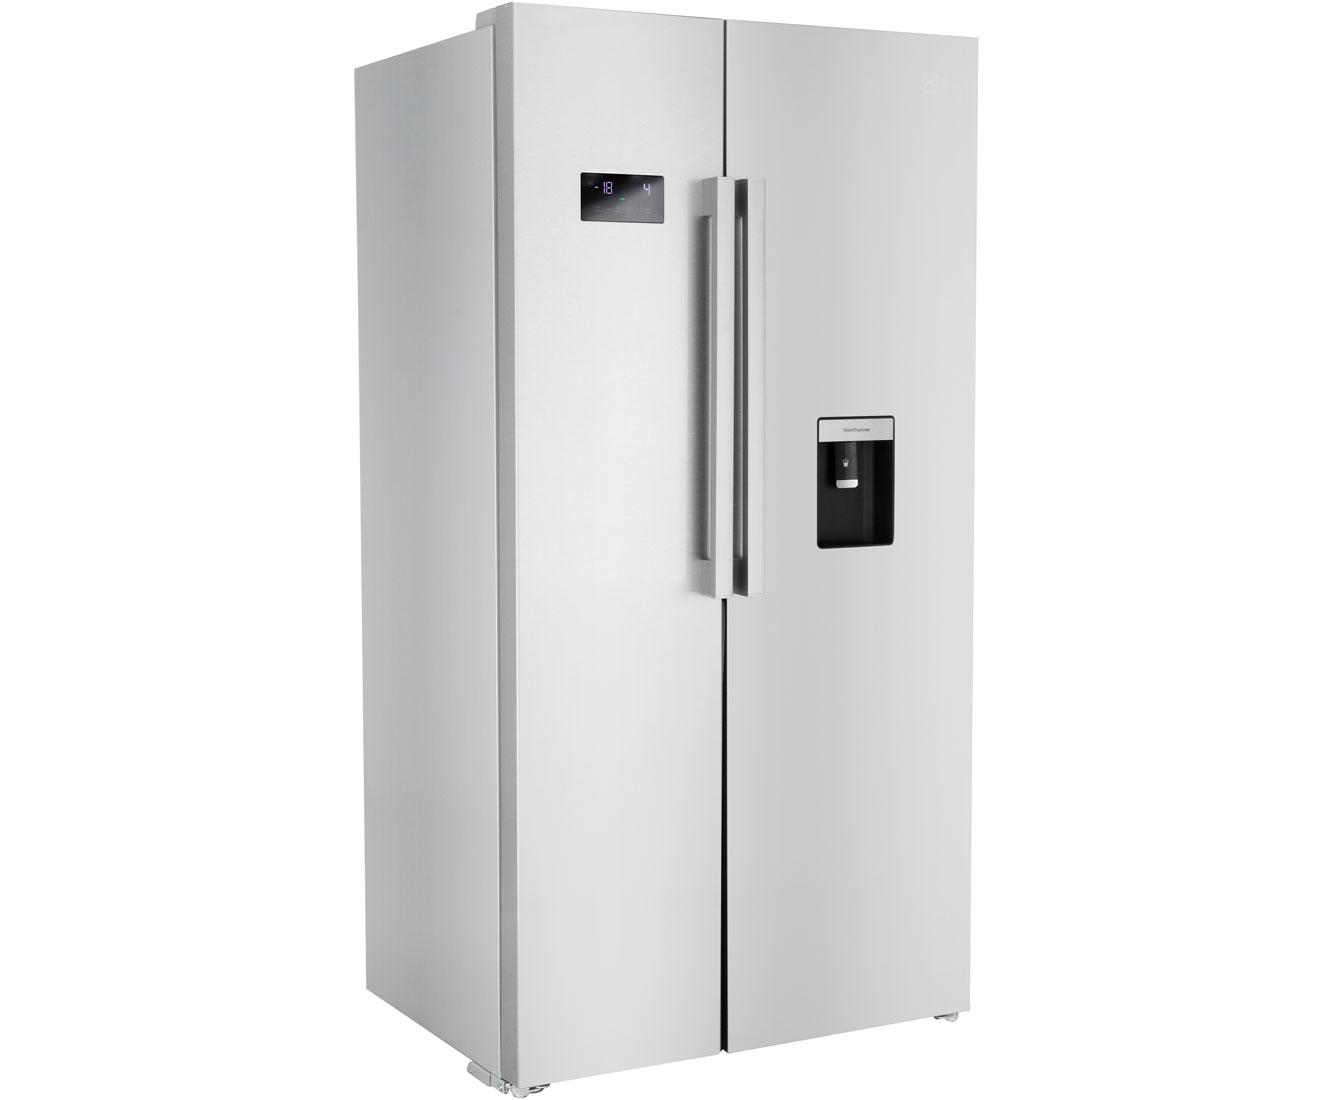 Side By Side Kühlschrank Eiswürfel Hygiene : Side by side kühlschrank der neue trend aus amerika